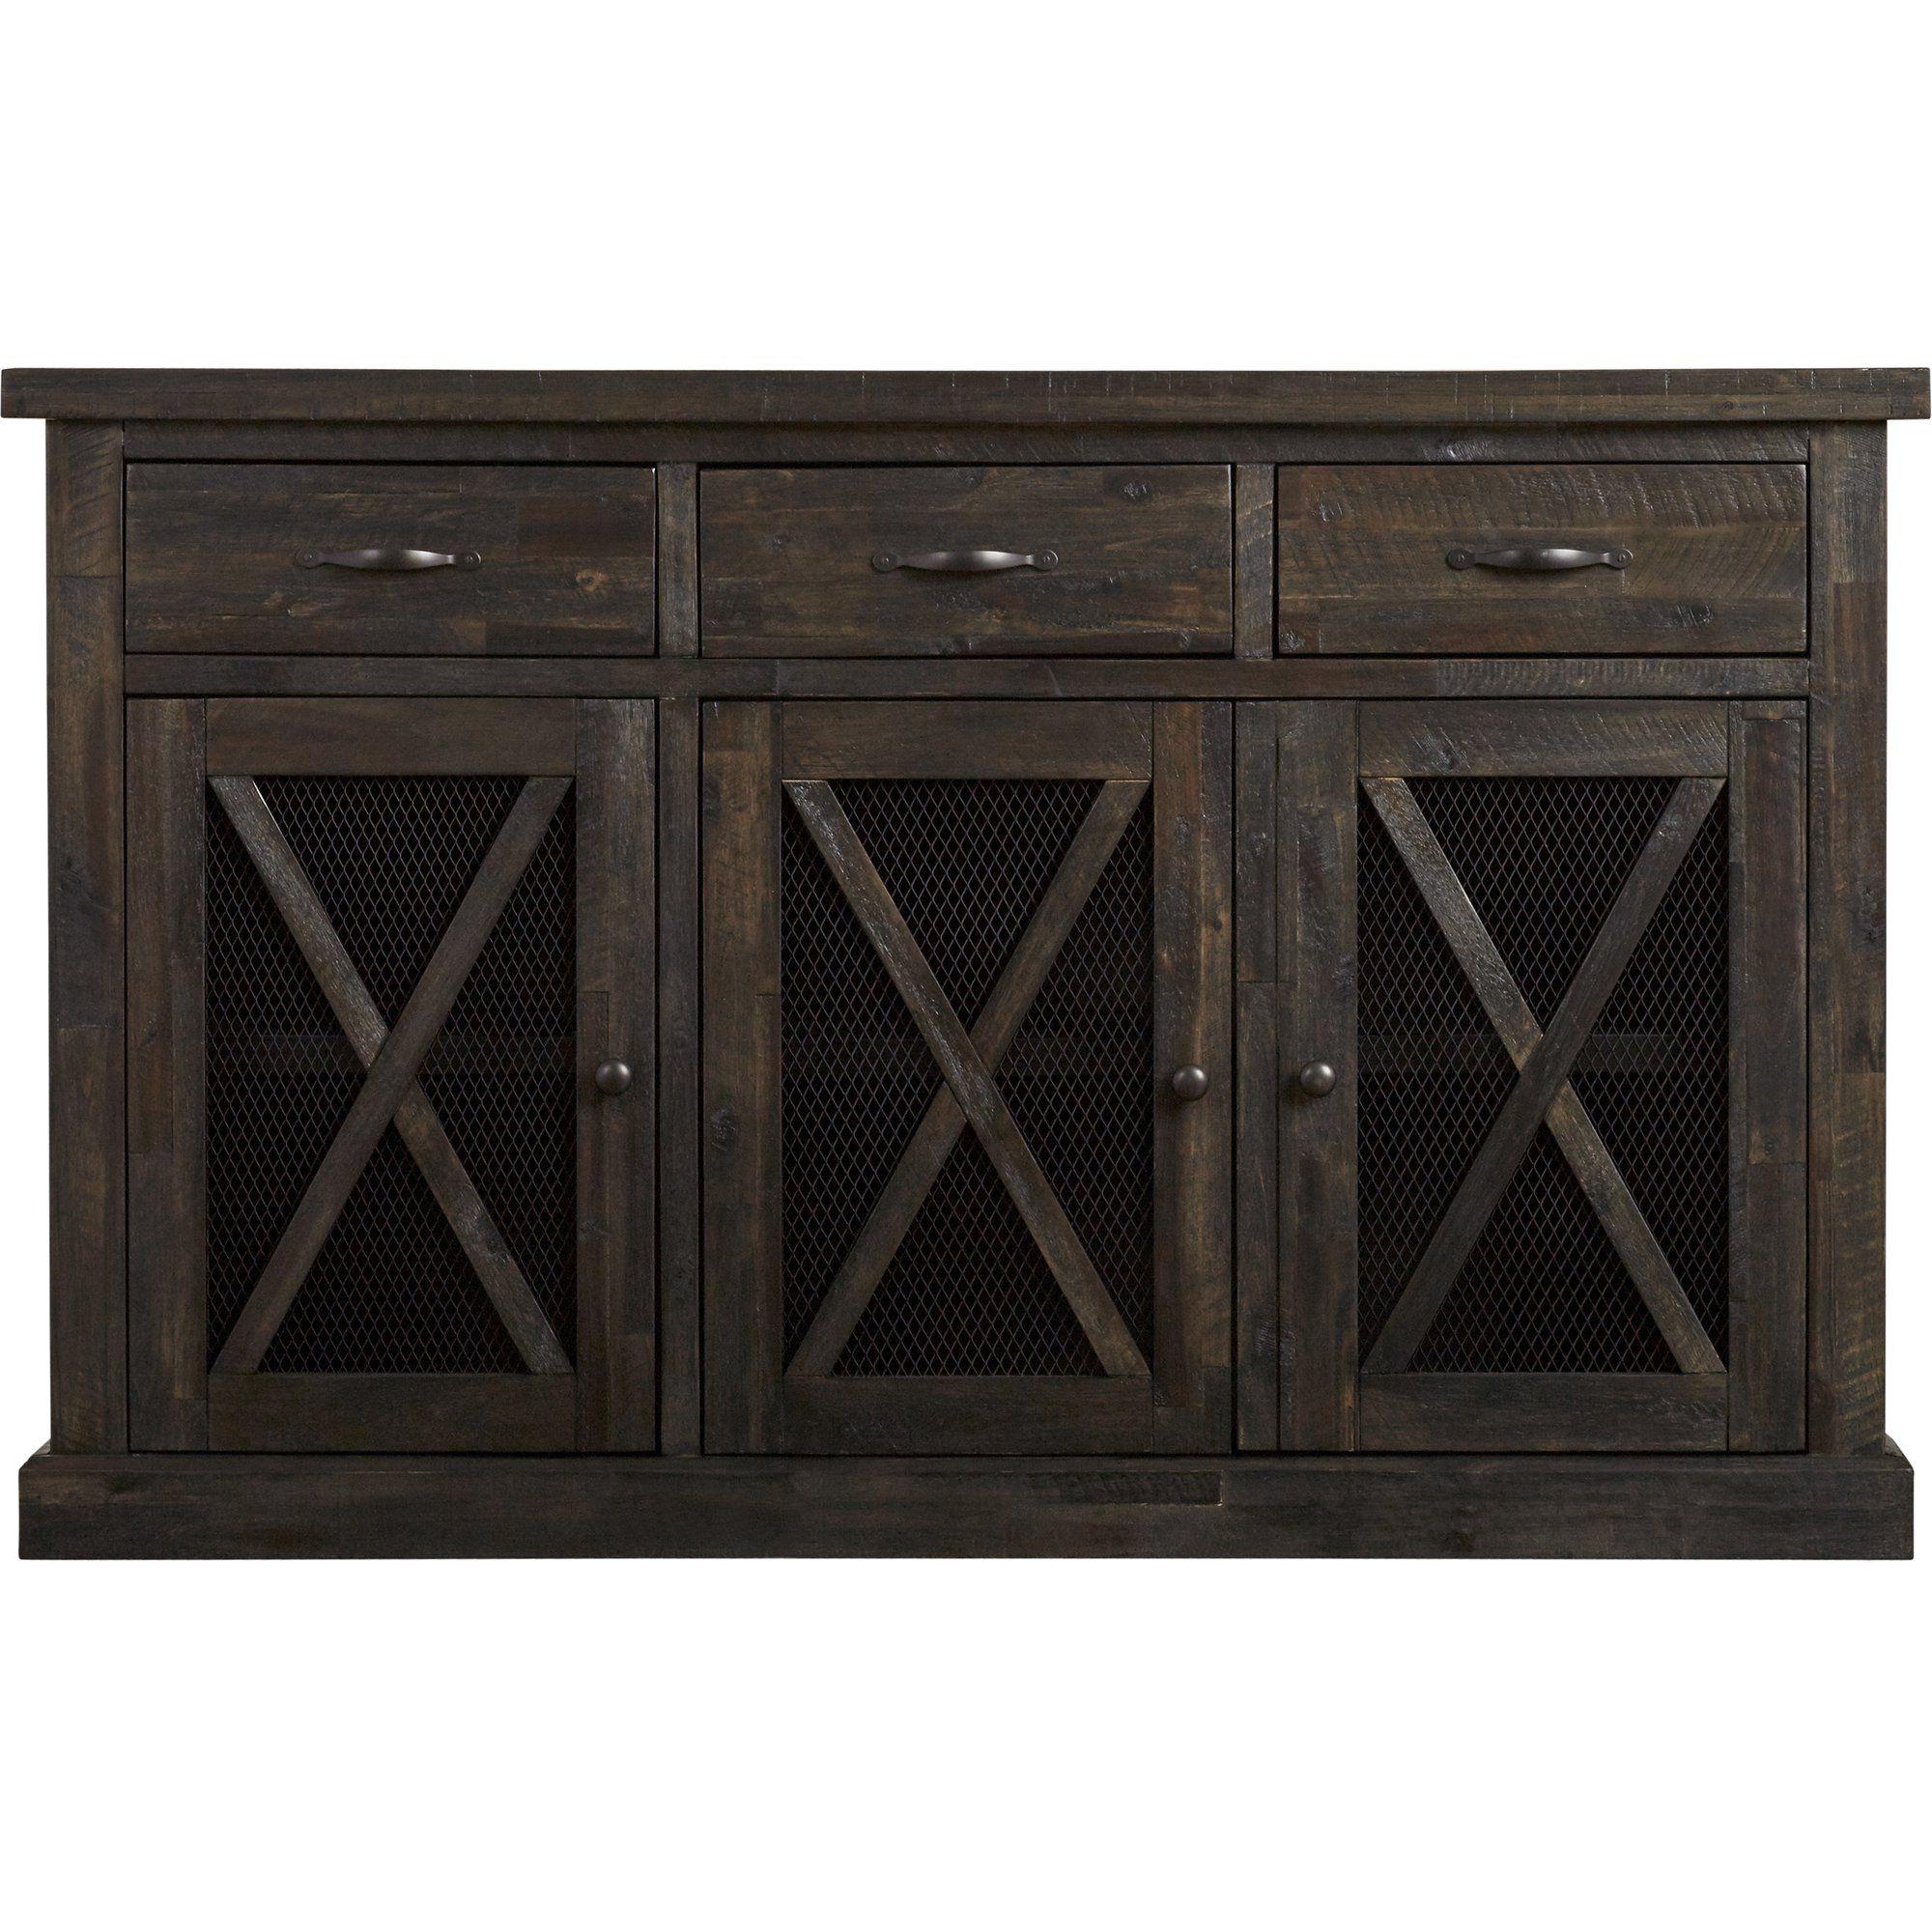 Colborne Sideboard | Home Sweet Home | Sideboard, Furniture Inside Colborne Sideboards (View 6 of 20)